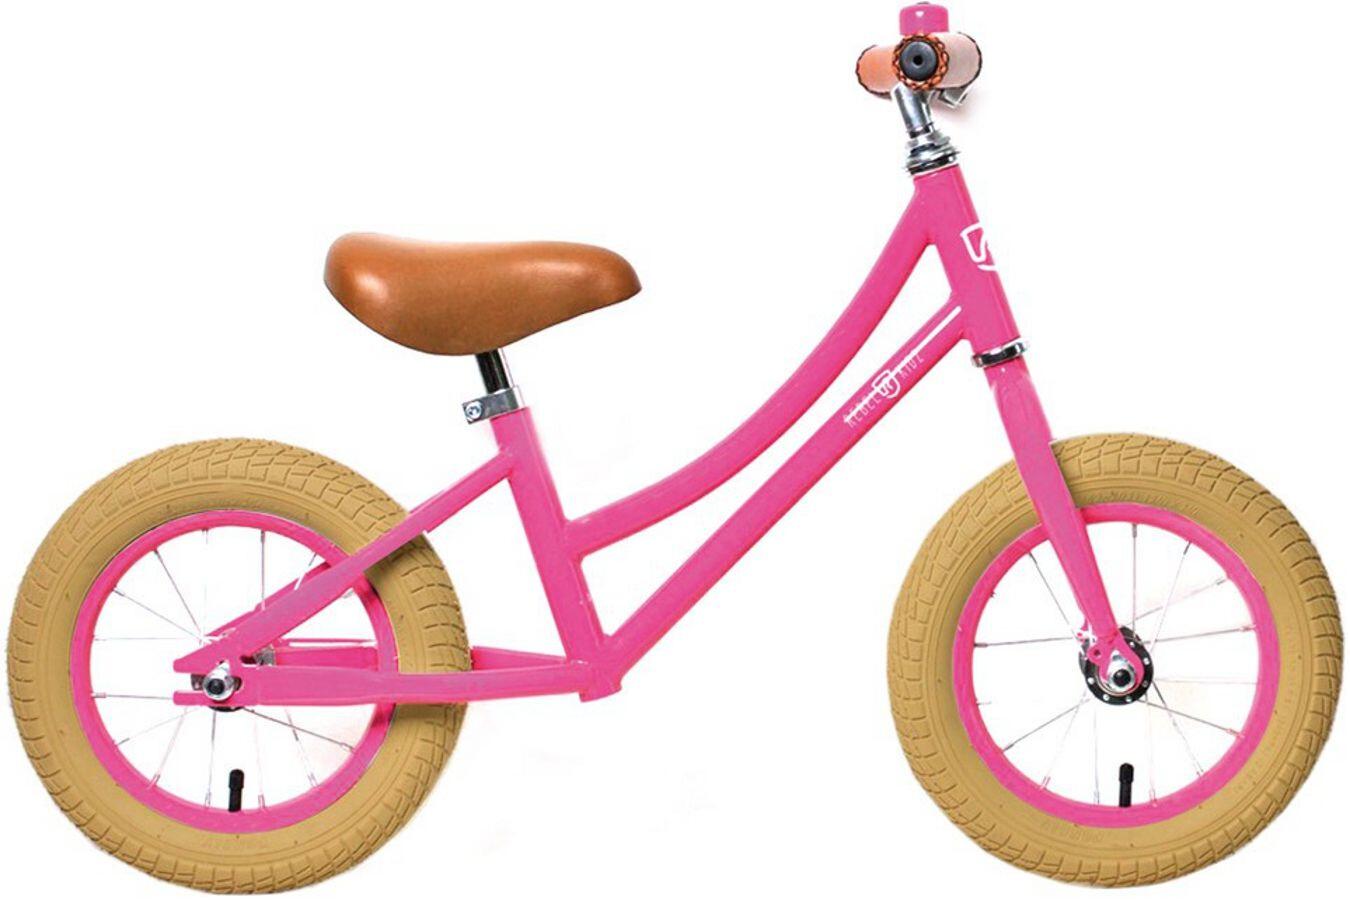 "Rebel Kidz Air Classic Balance Bike 12,5"" Kids, pink (2019) | Learner Bikes"